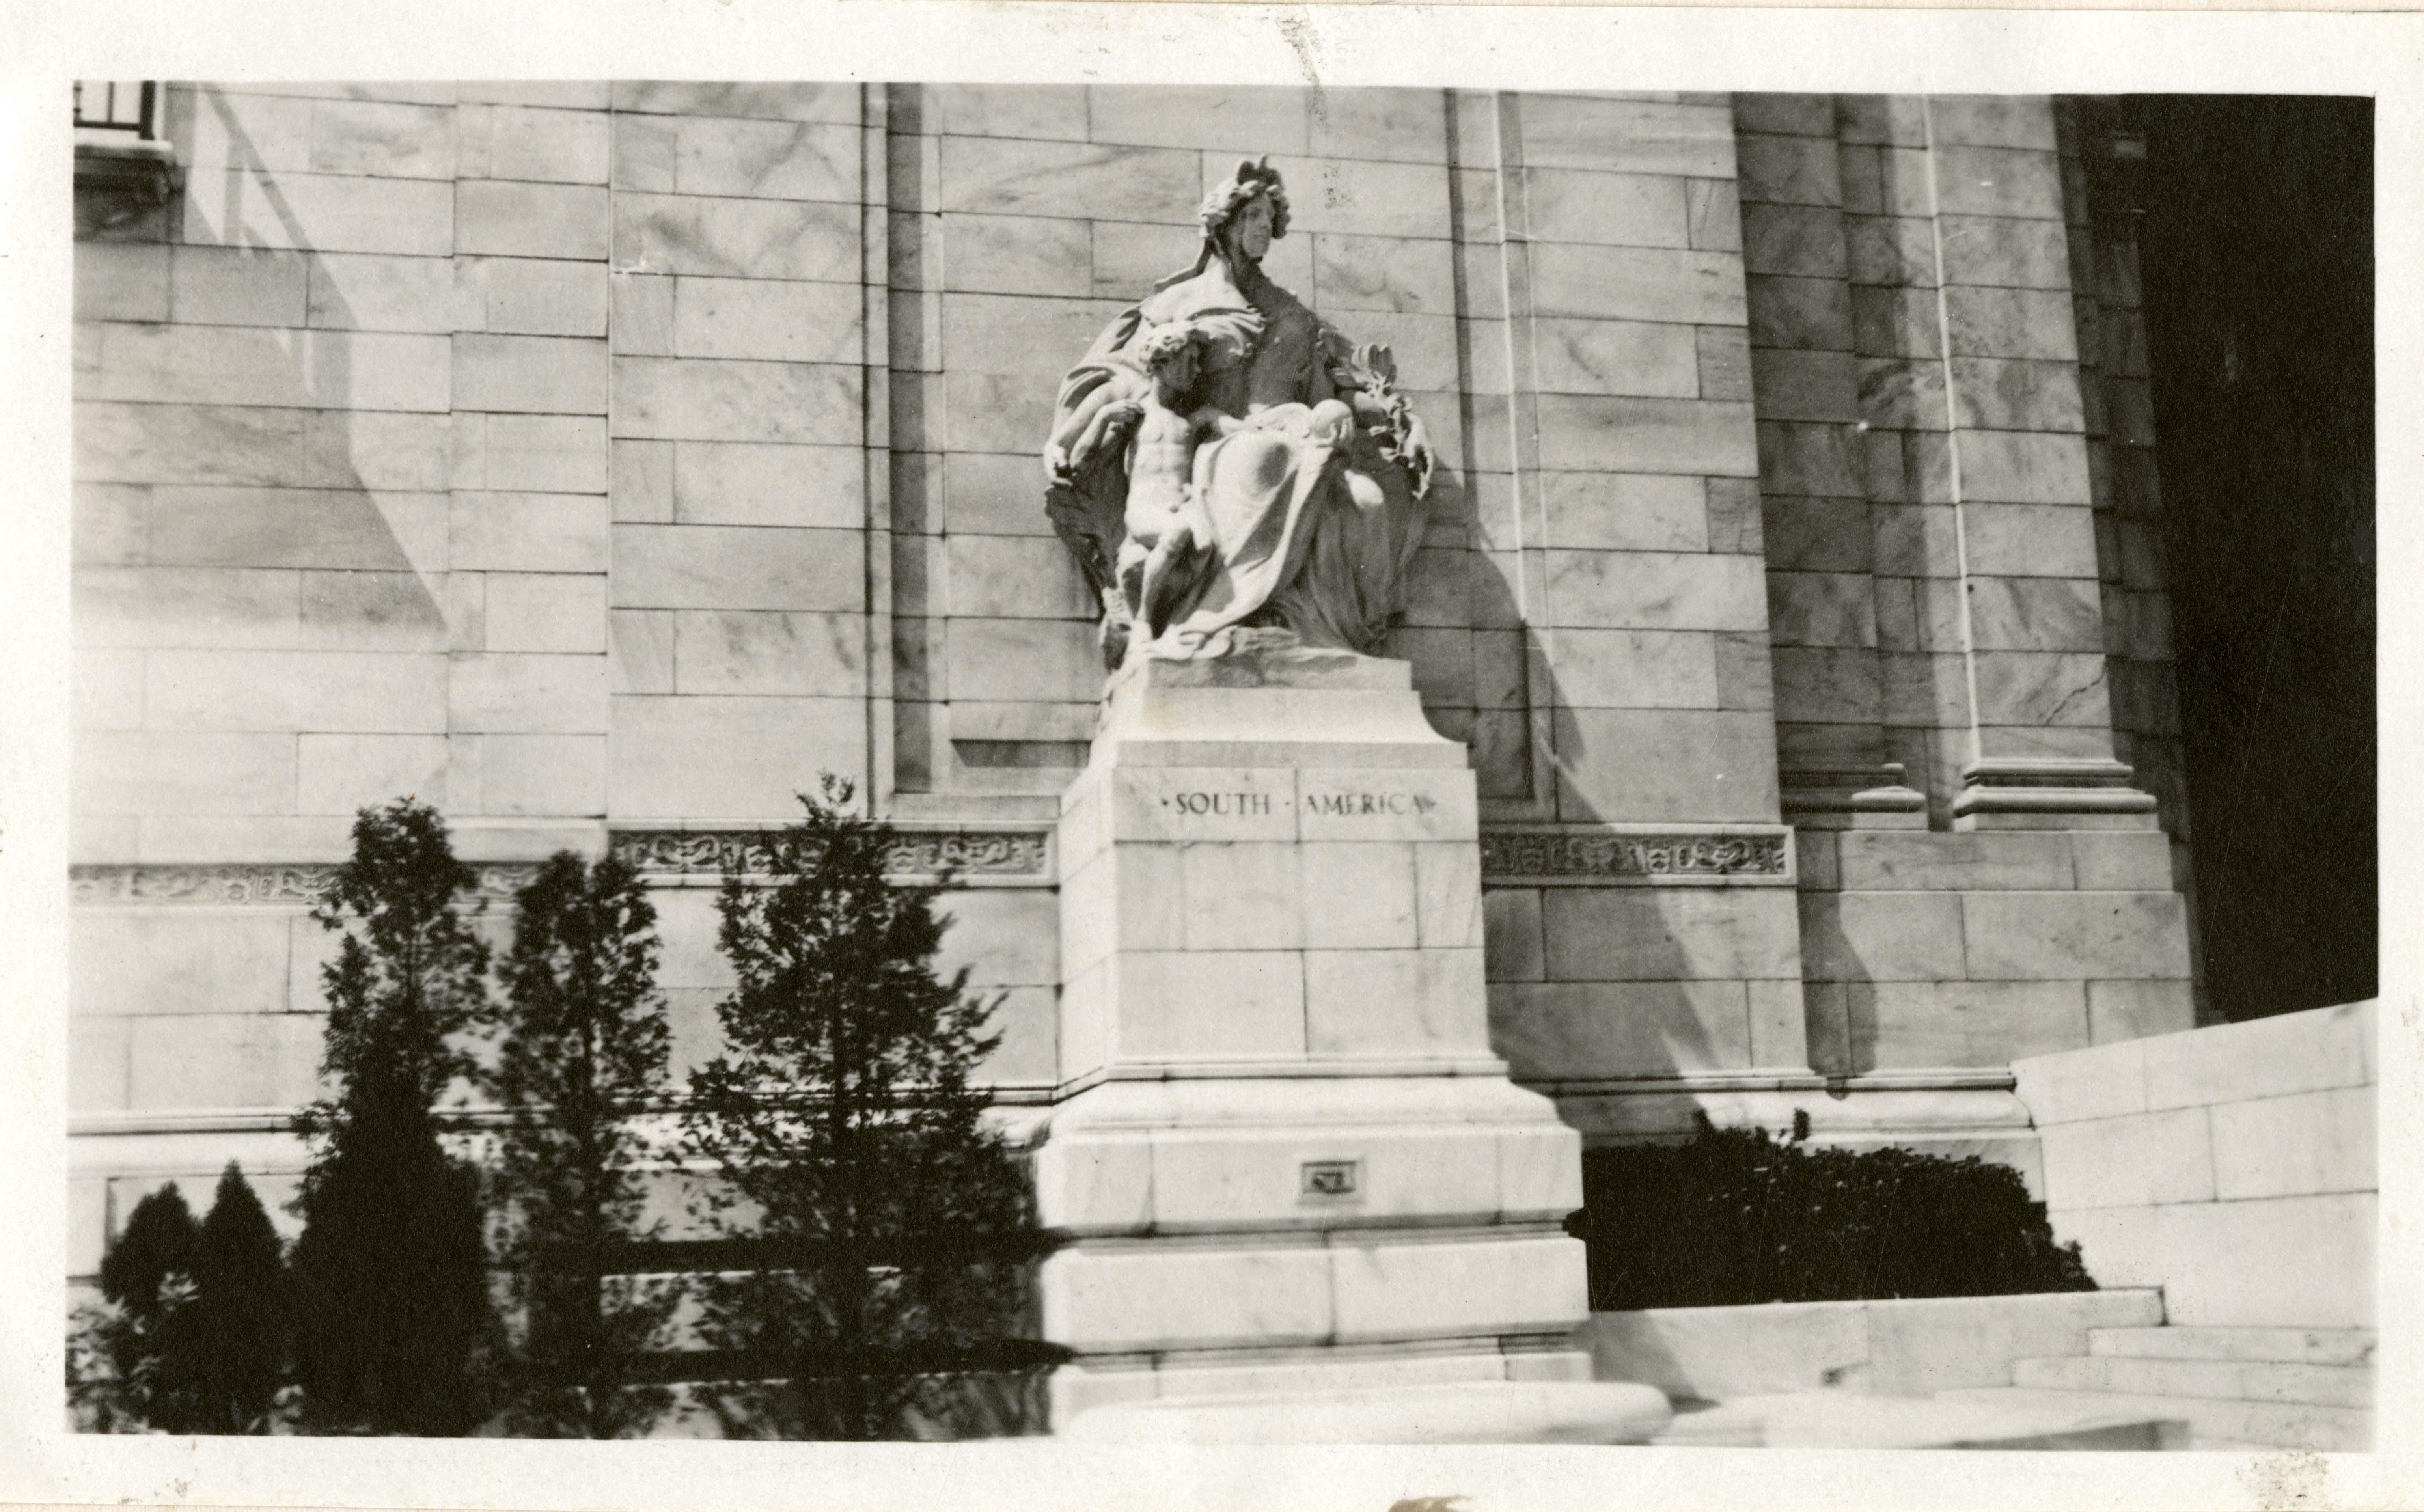 South America Statue